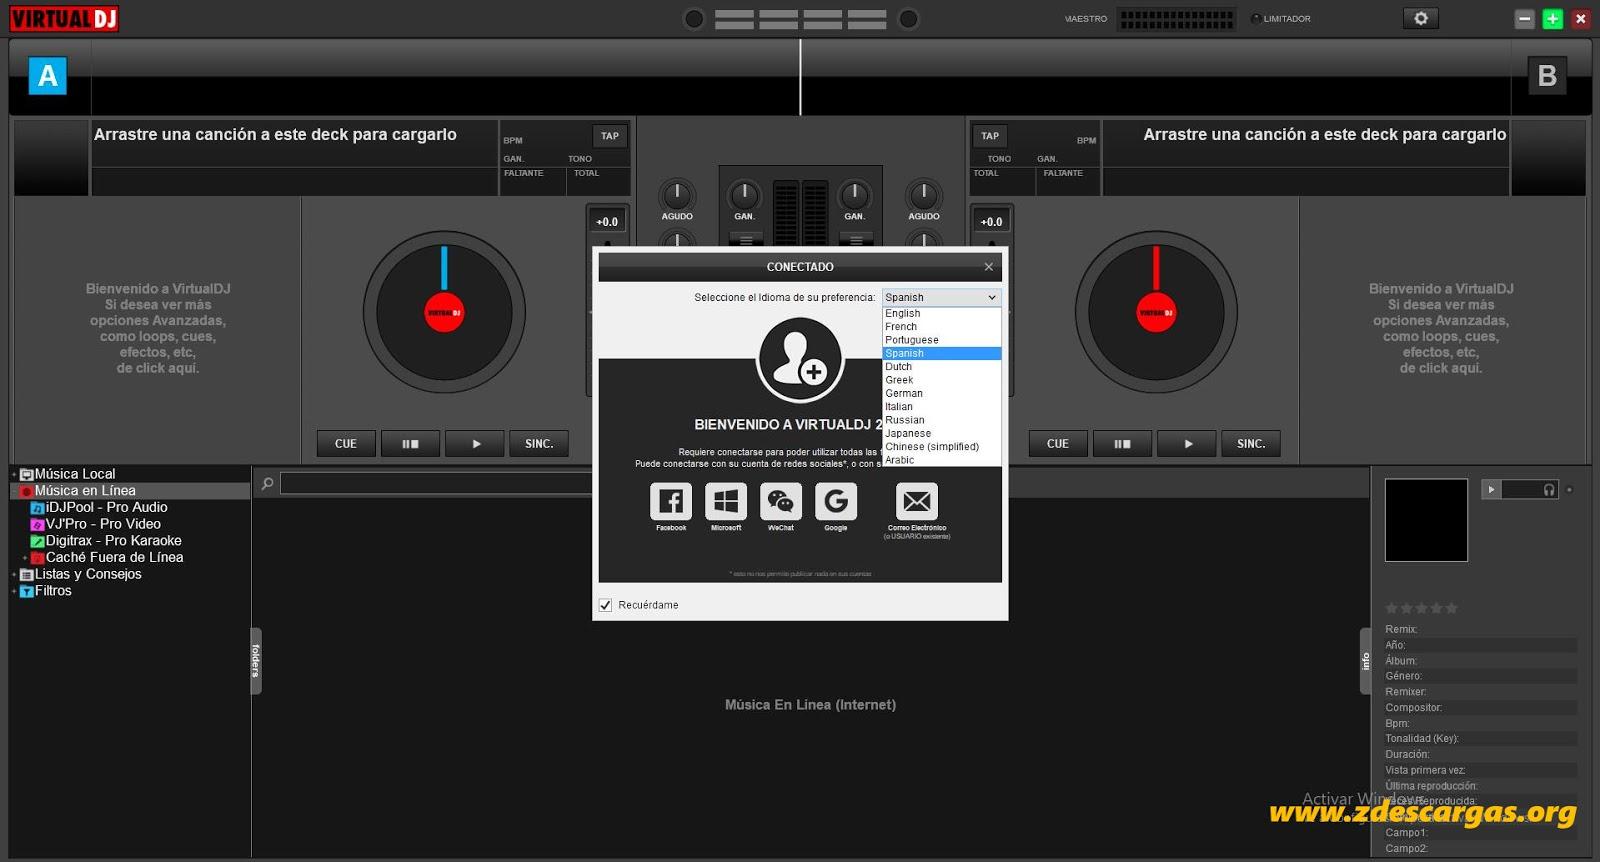 VirtualDJ Pro 8 Full Español